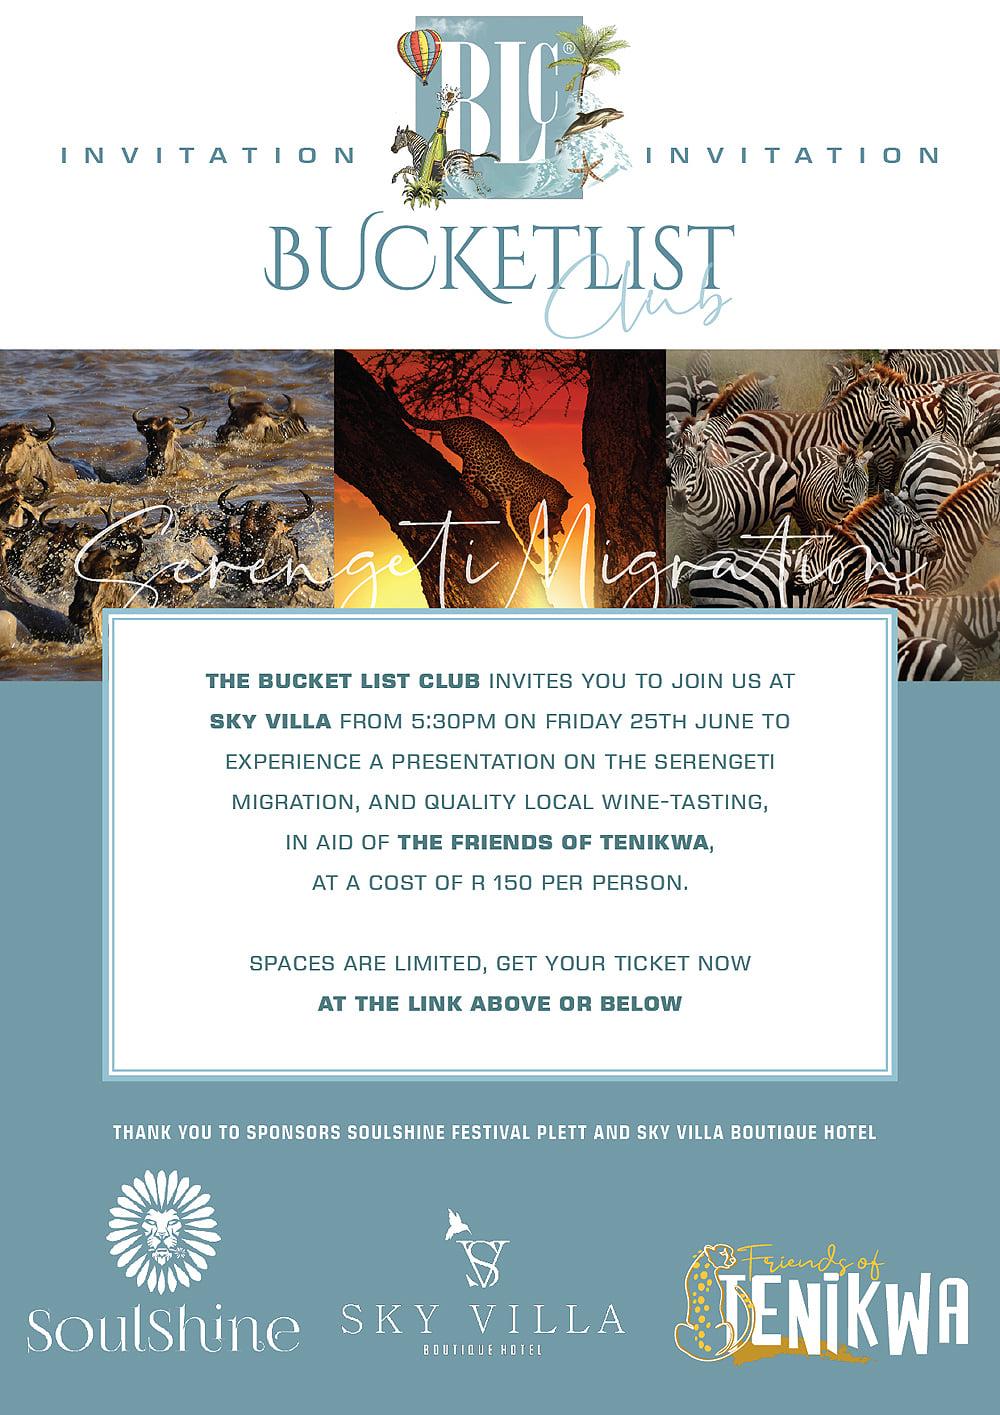 Bucket List Serengeti Migration Talk and Wine Tasting in aid of the Friends of Tenikwa